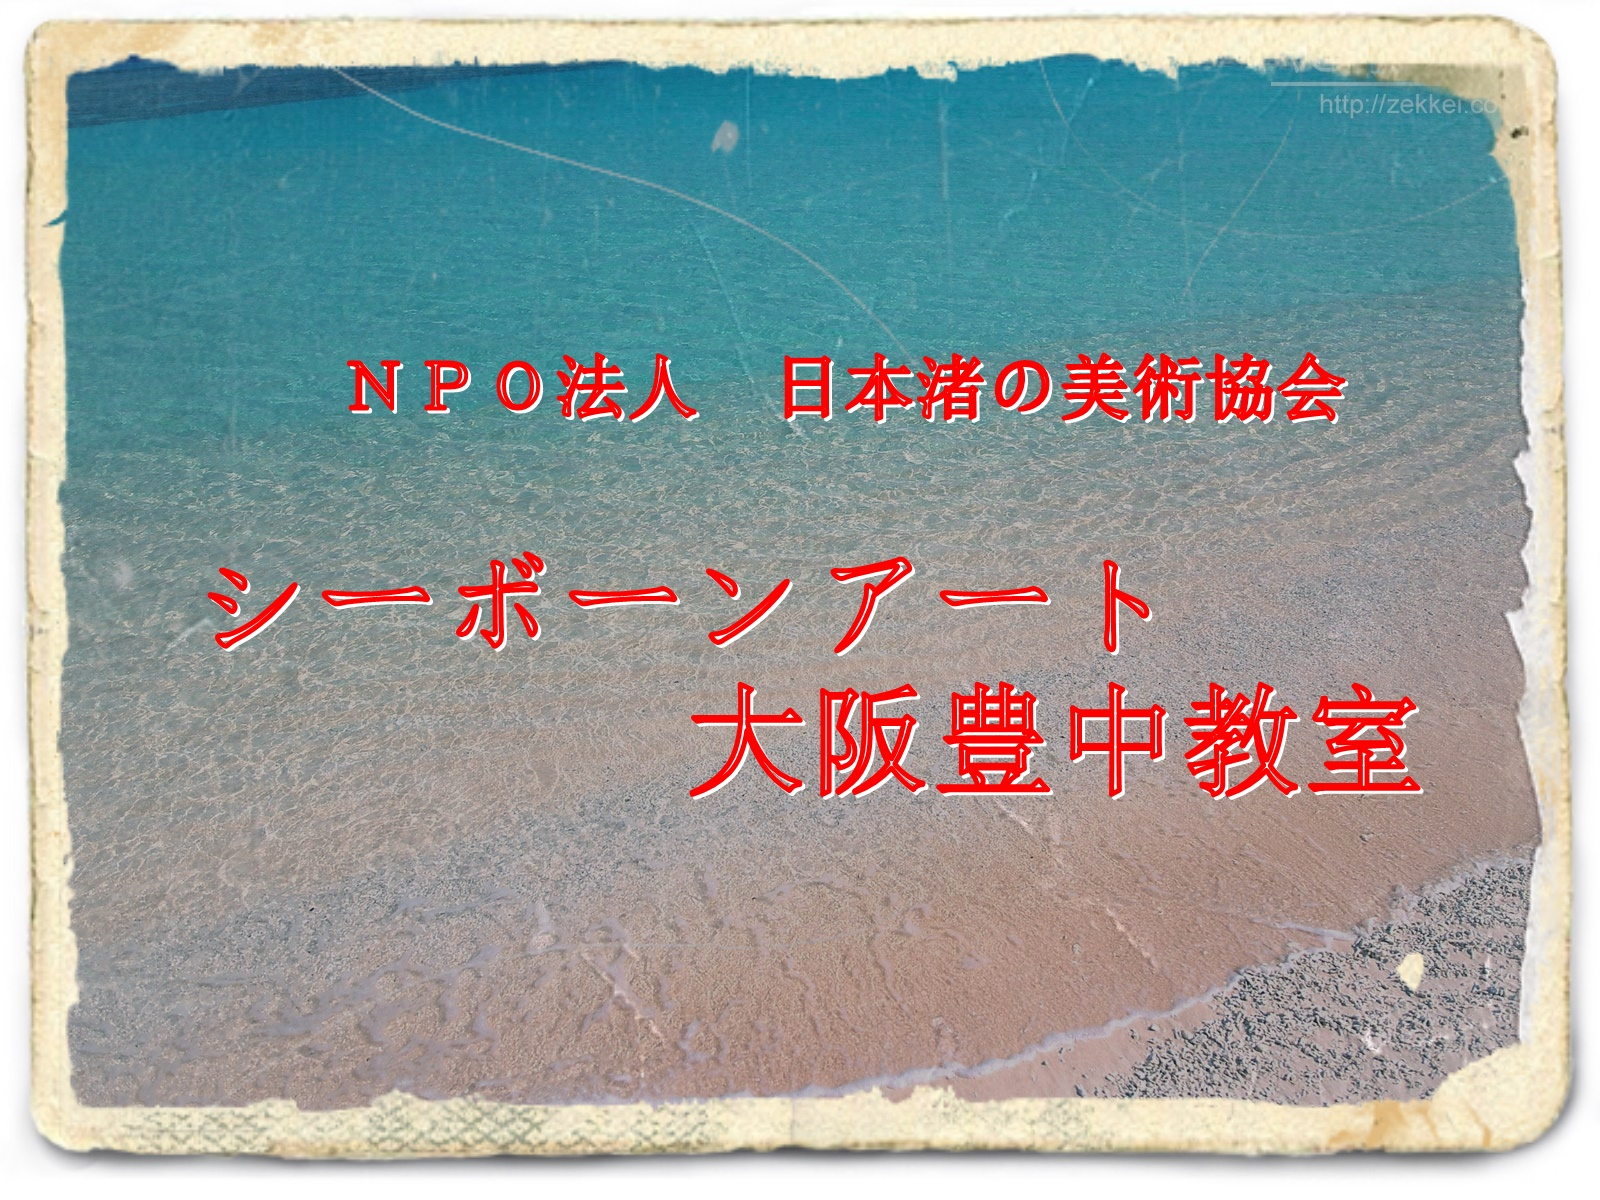 NPO法人 日本渚の美術協会 シーボーンアート阪豊中教室